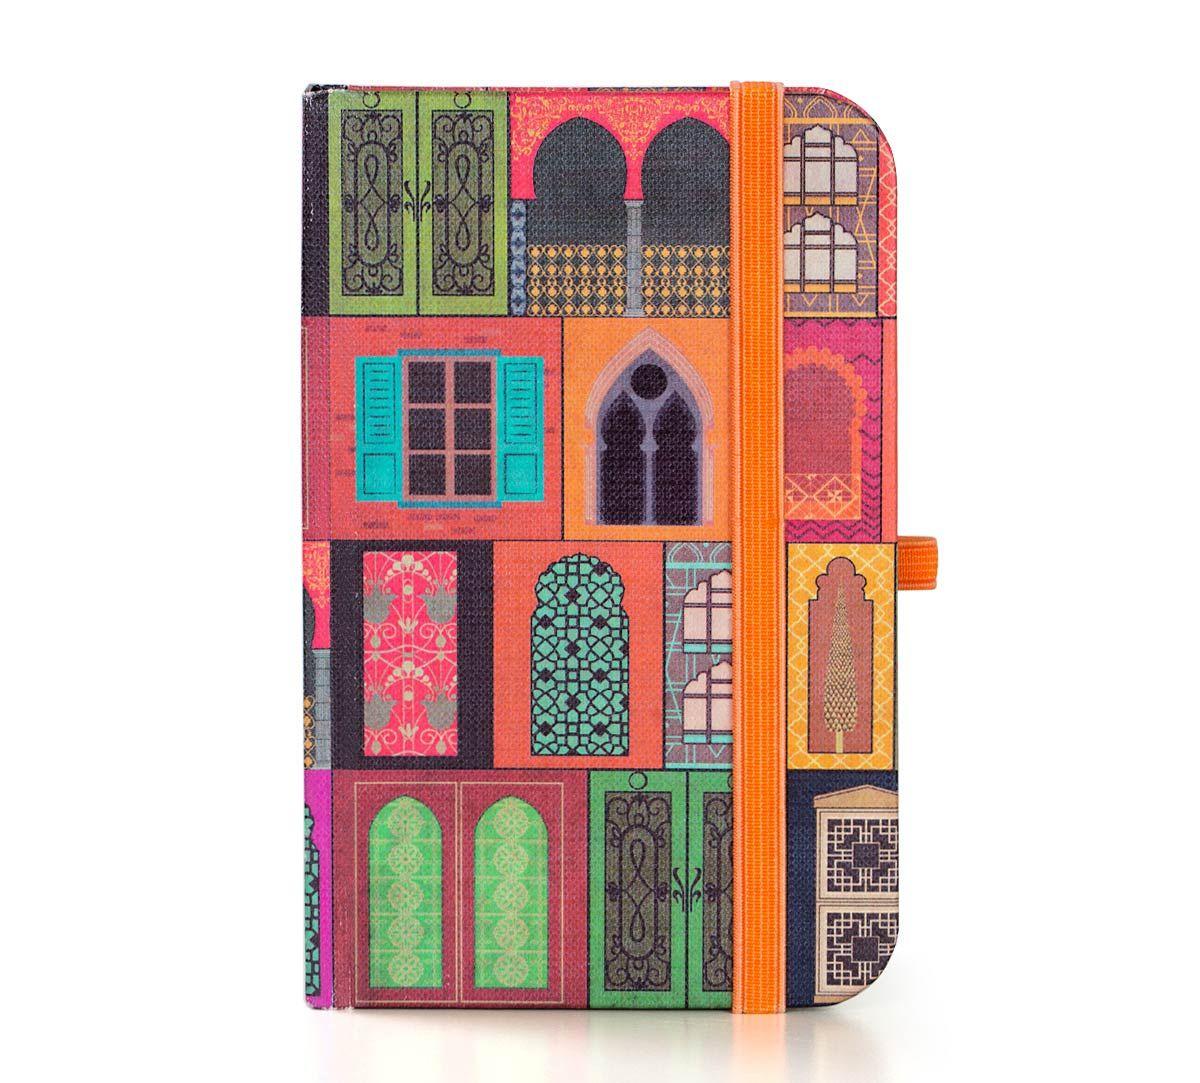 India Circus Mughal Doors Reiteration Pocket Diary